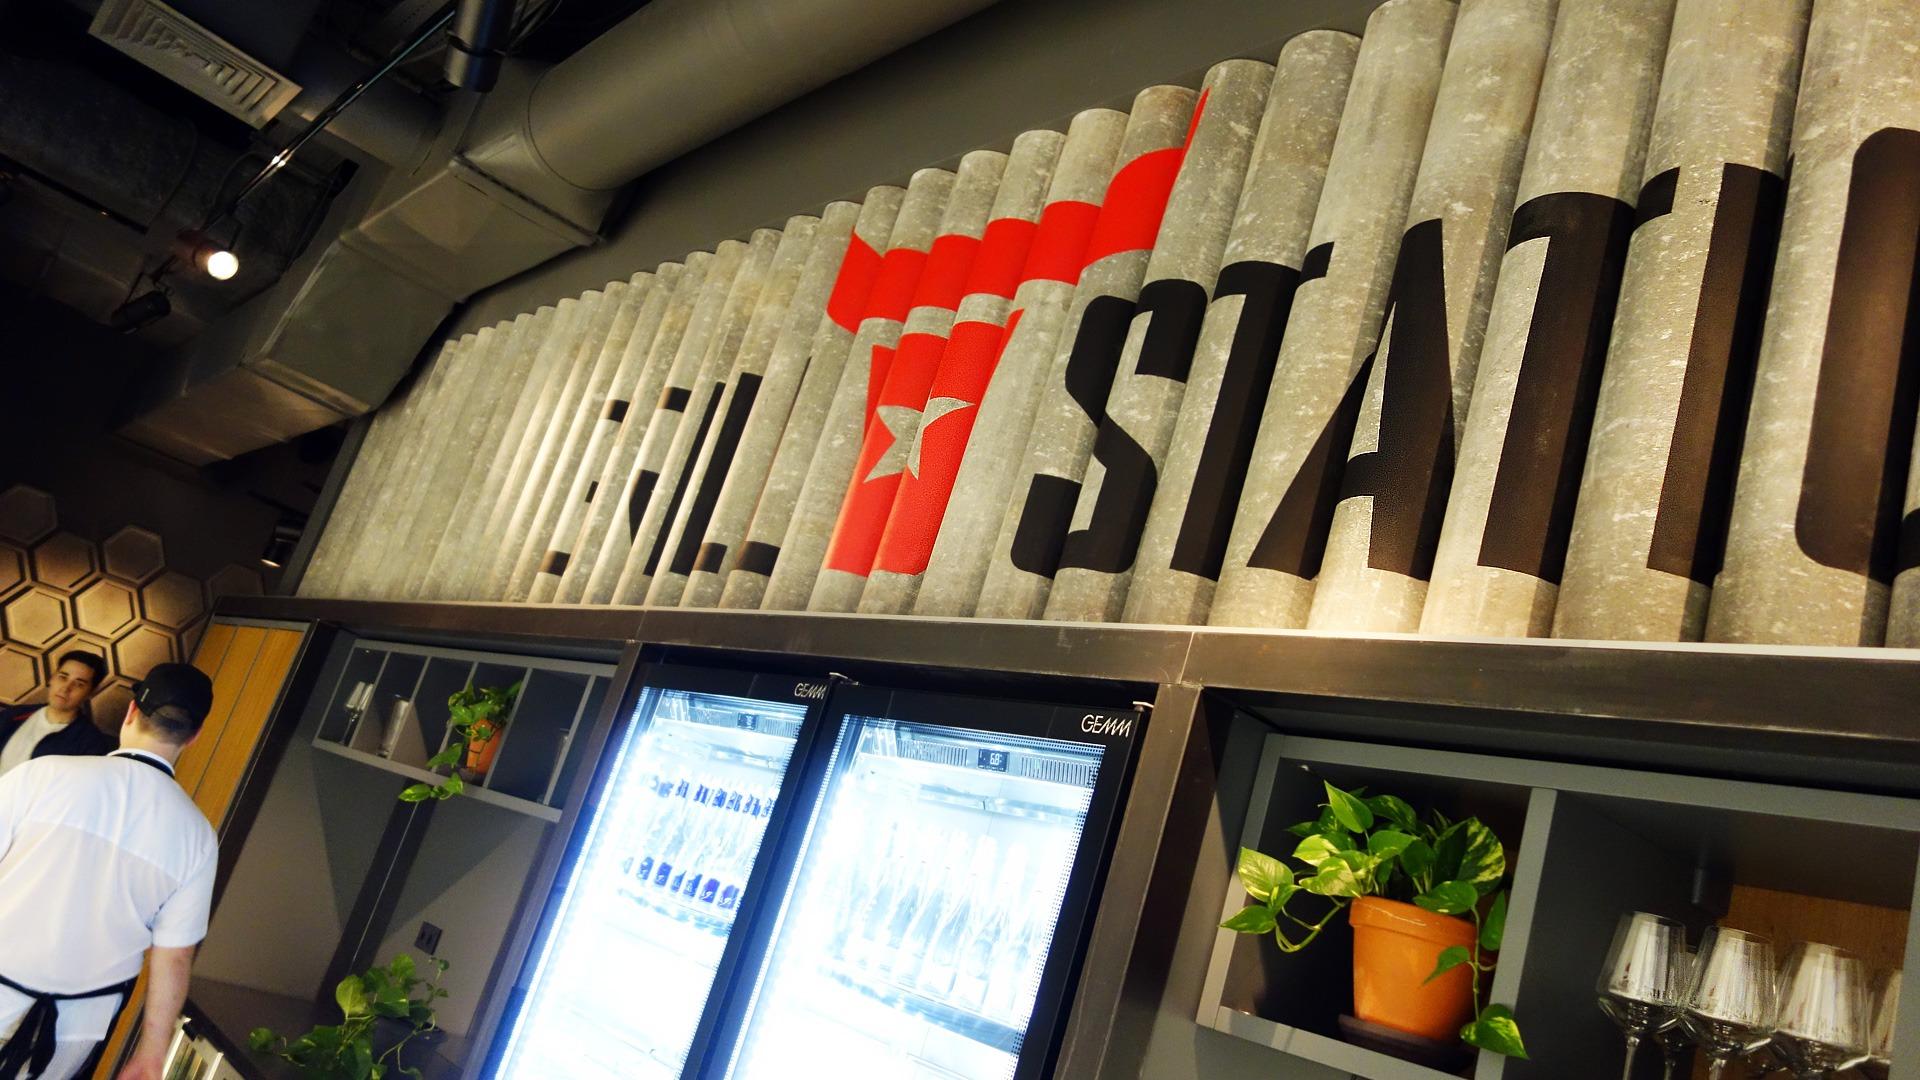 Фирменный стиль в интерьере, Asgard Branding, restaurant logo, ресторан Grillstation, branding design identity